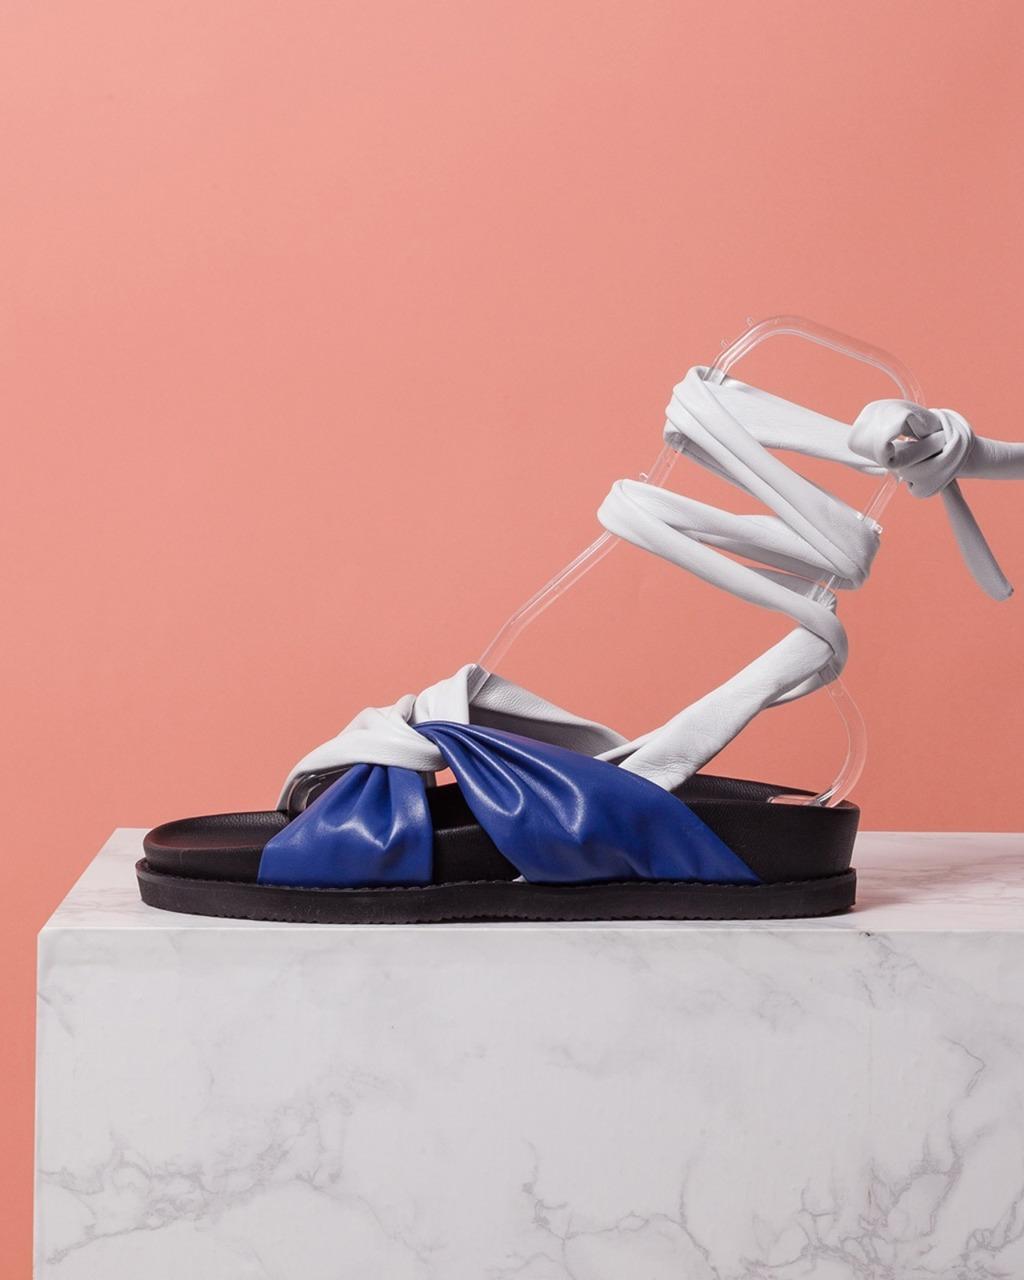 DORATORE Fiori Blue - Women's Shoes : Republic of Korea